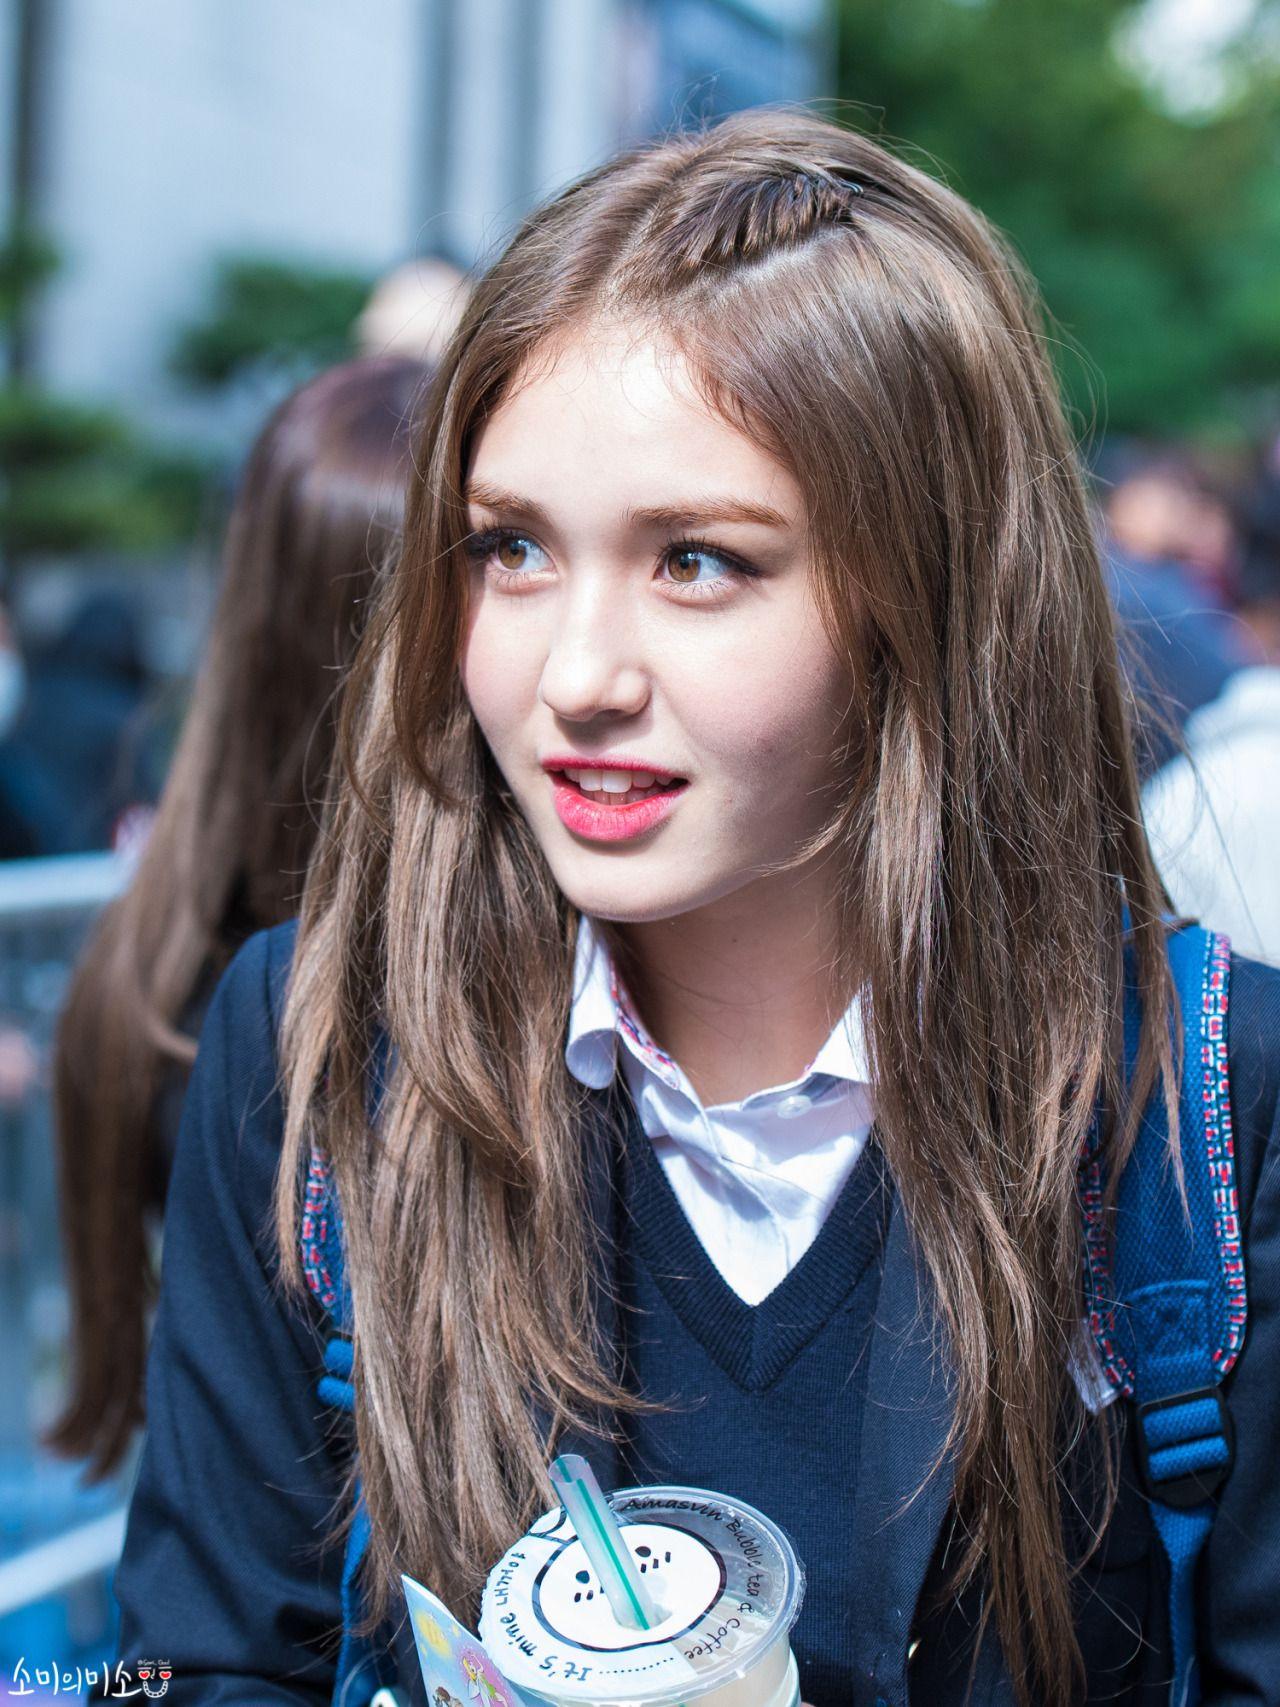 Jeon Somi Korean Canadian Singer Gaya Rambut Gaya Rambut Korea Ide Gaya Rambut